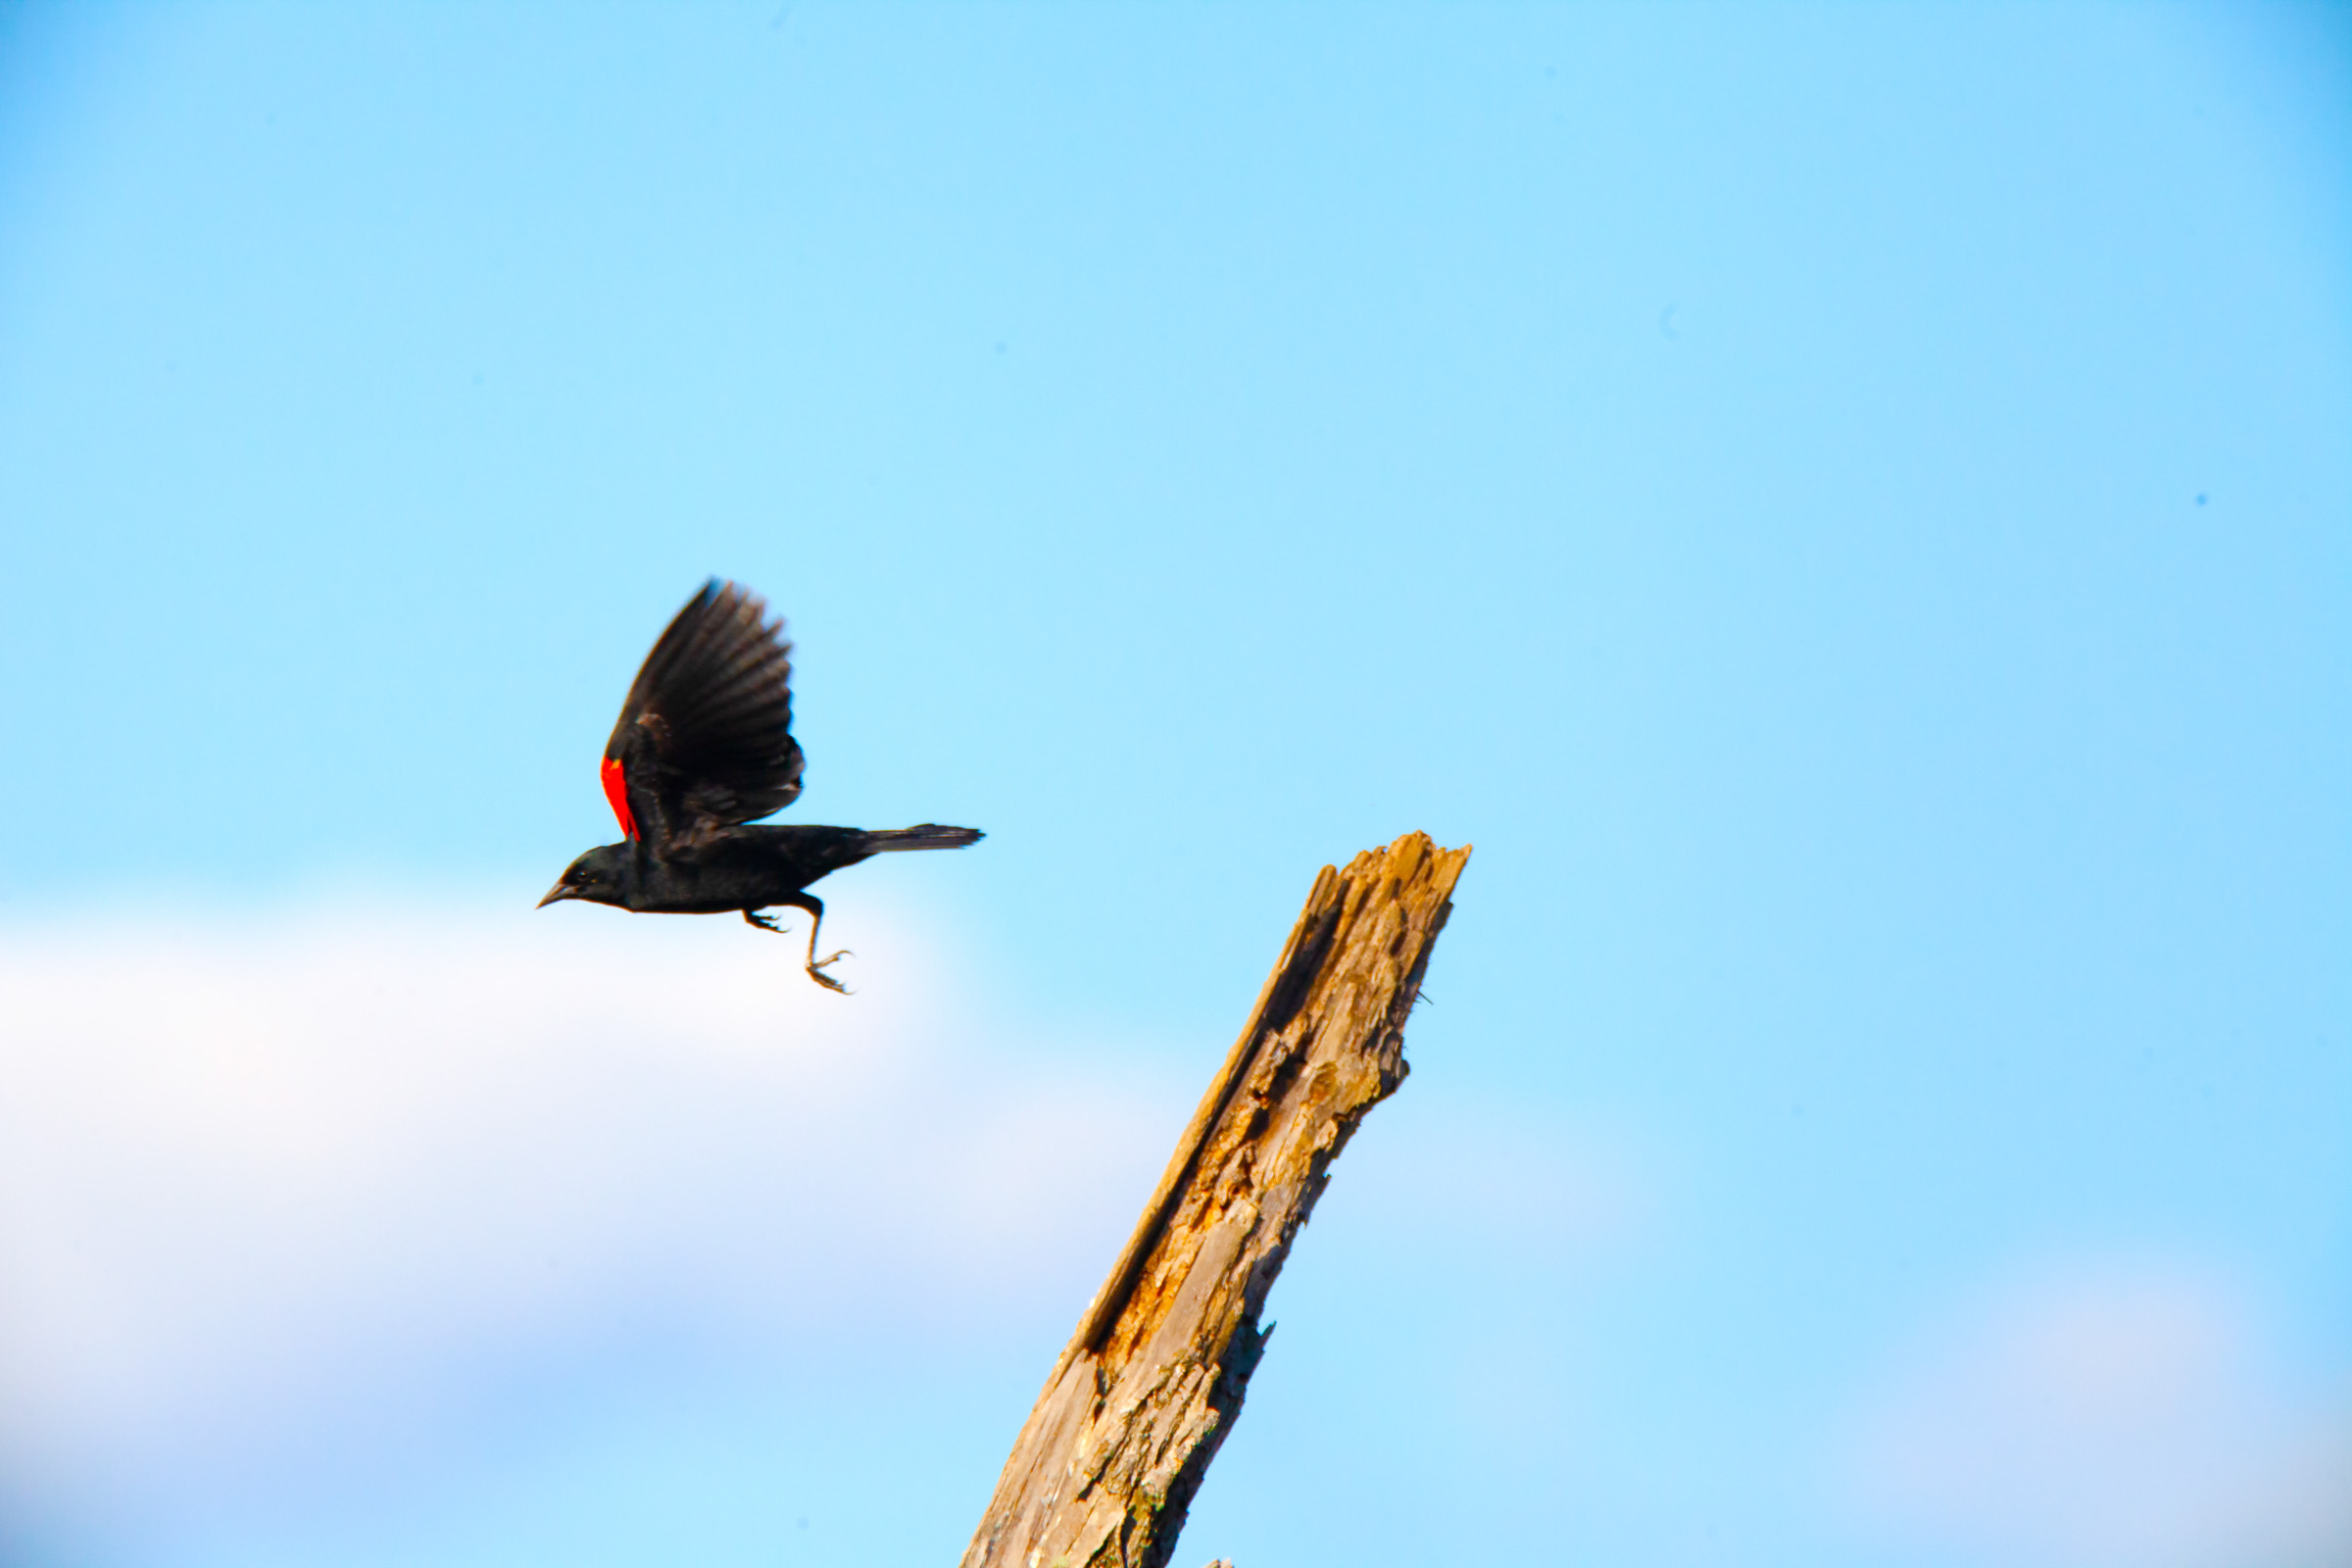 Black bird red back taking off.jpg